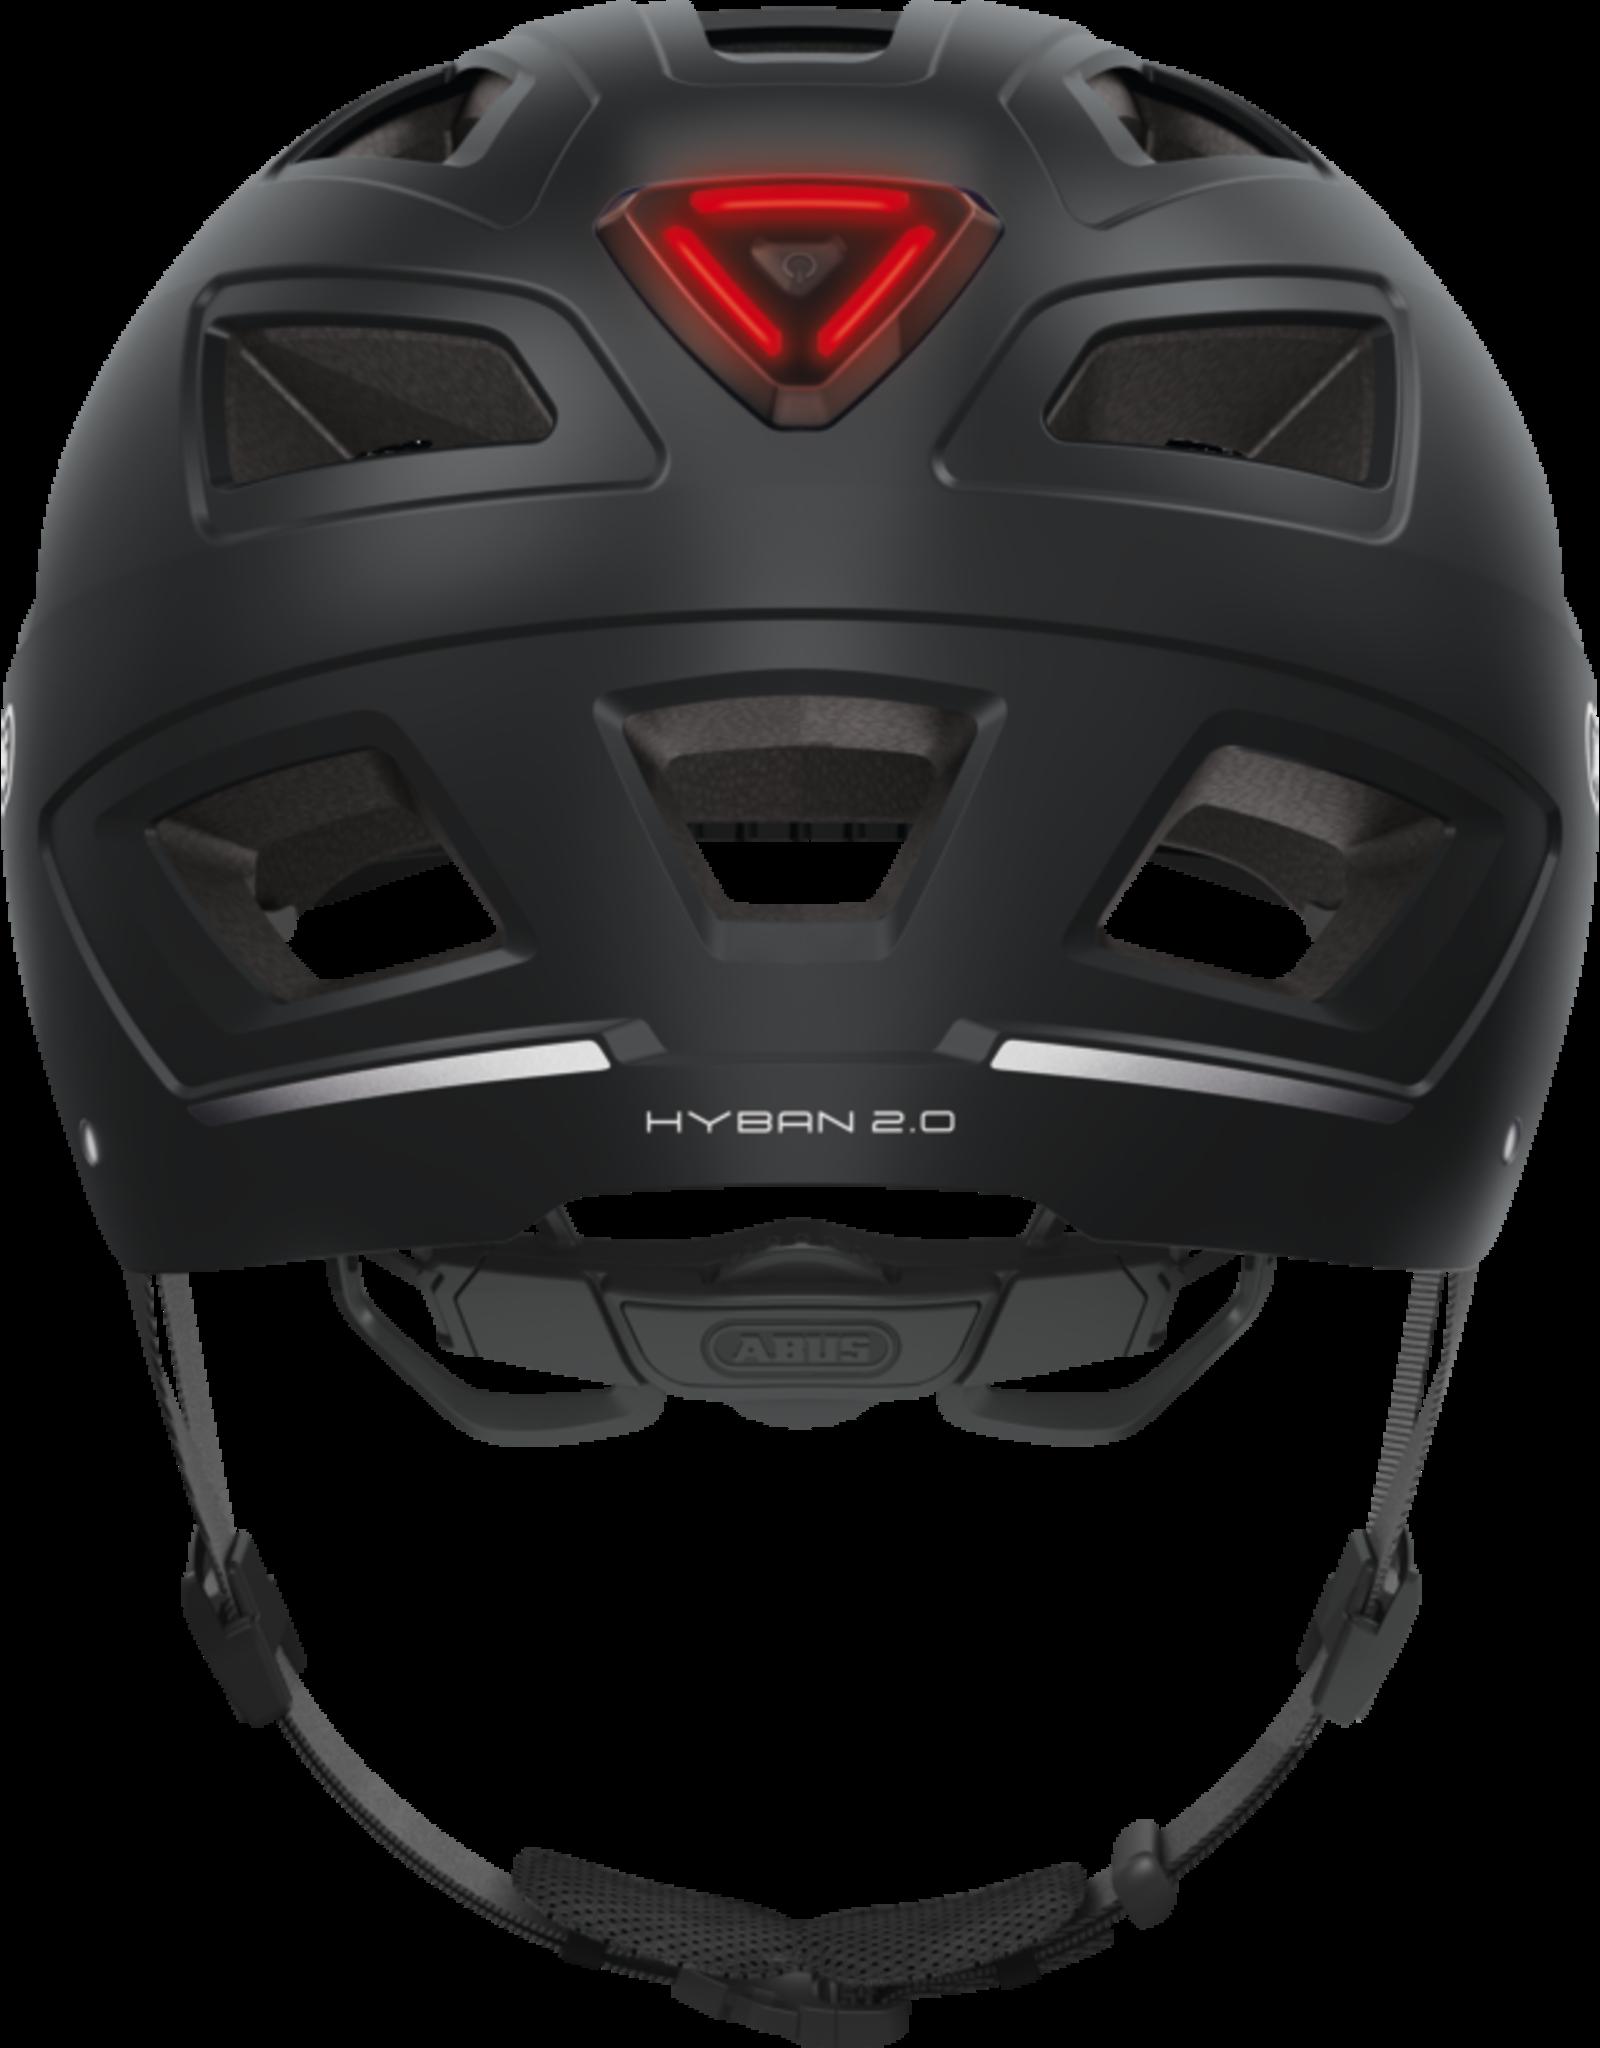 ABUS Abus Hyban 2.0 Helmet